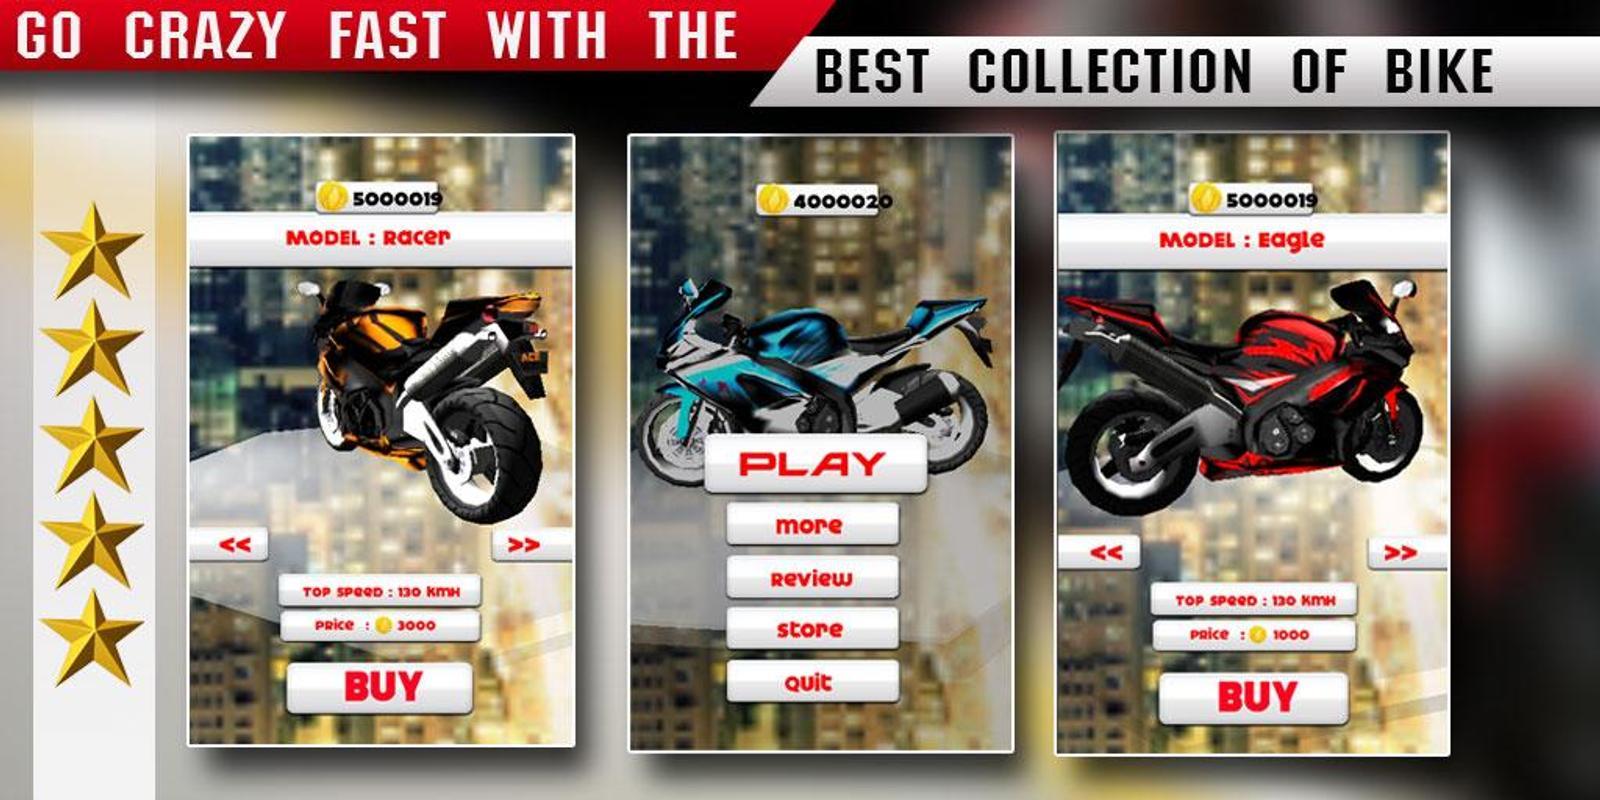 Motogp Game Apk | MotoGP 2017 Info, Video, Points Table